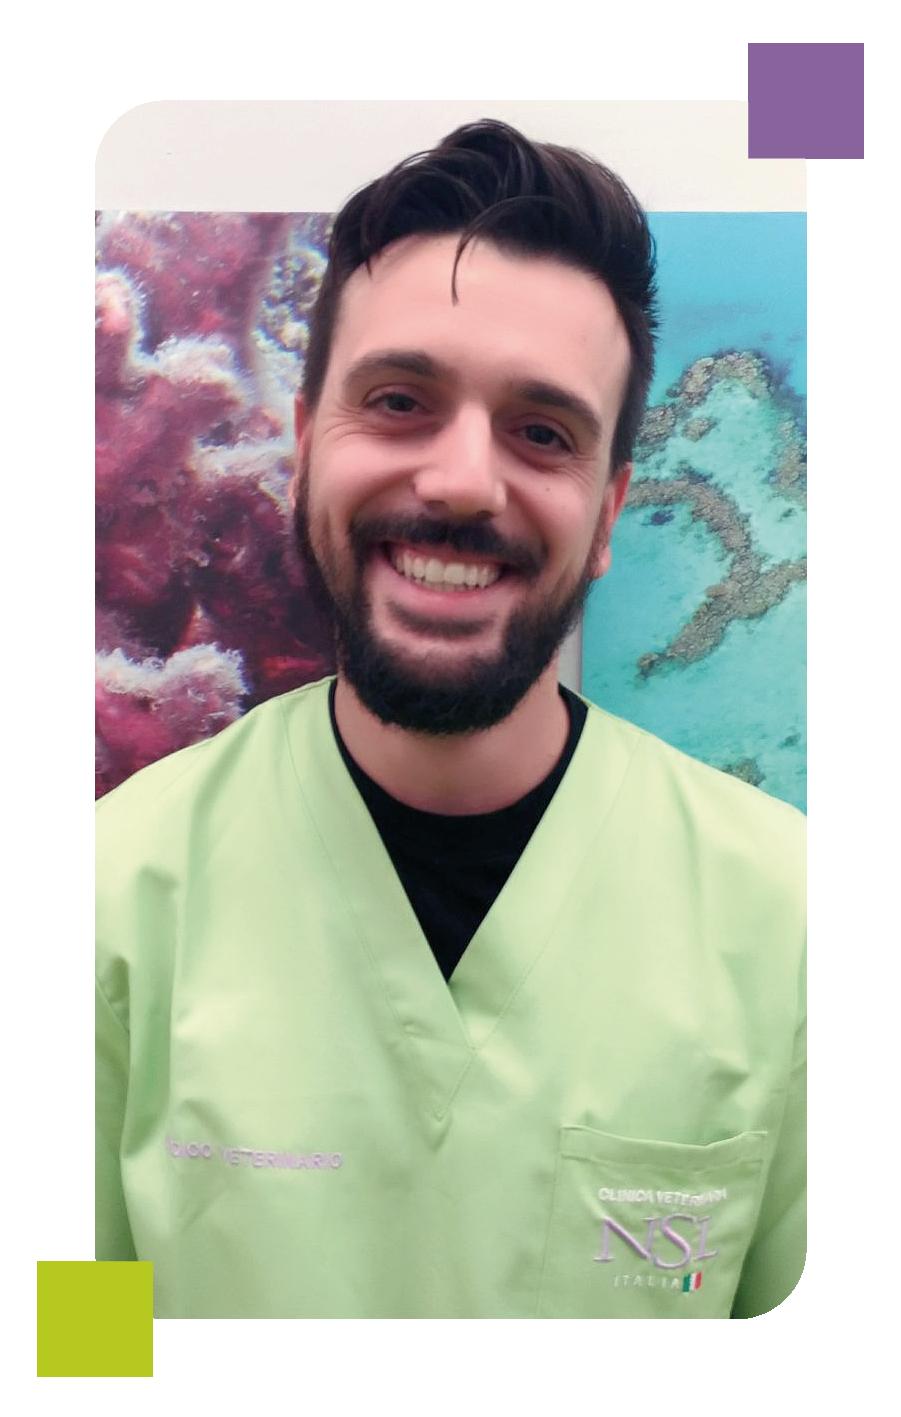 Dott. Gianni Montani